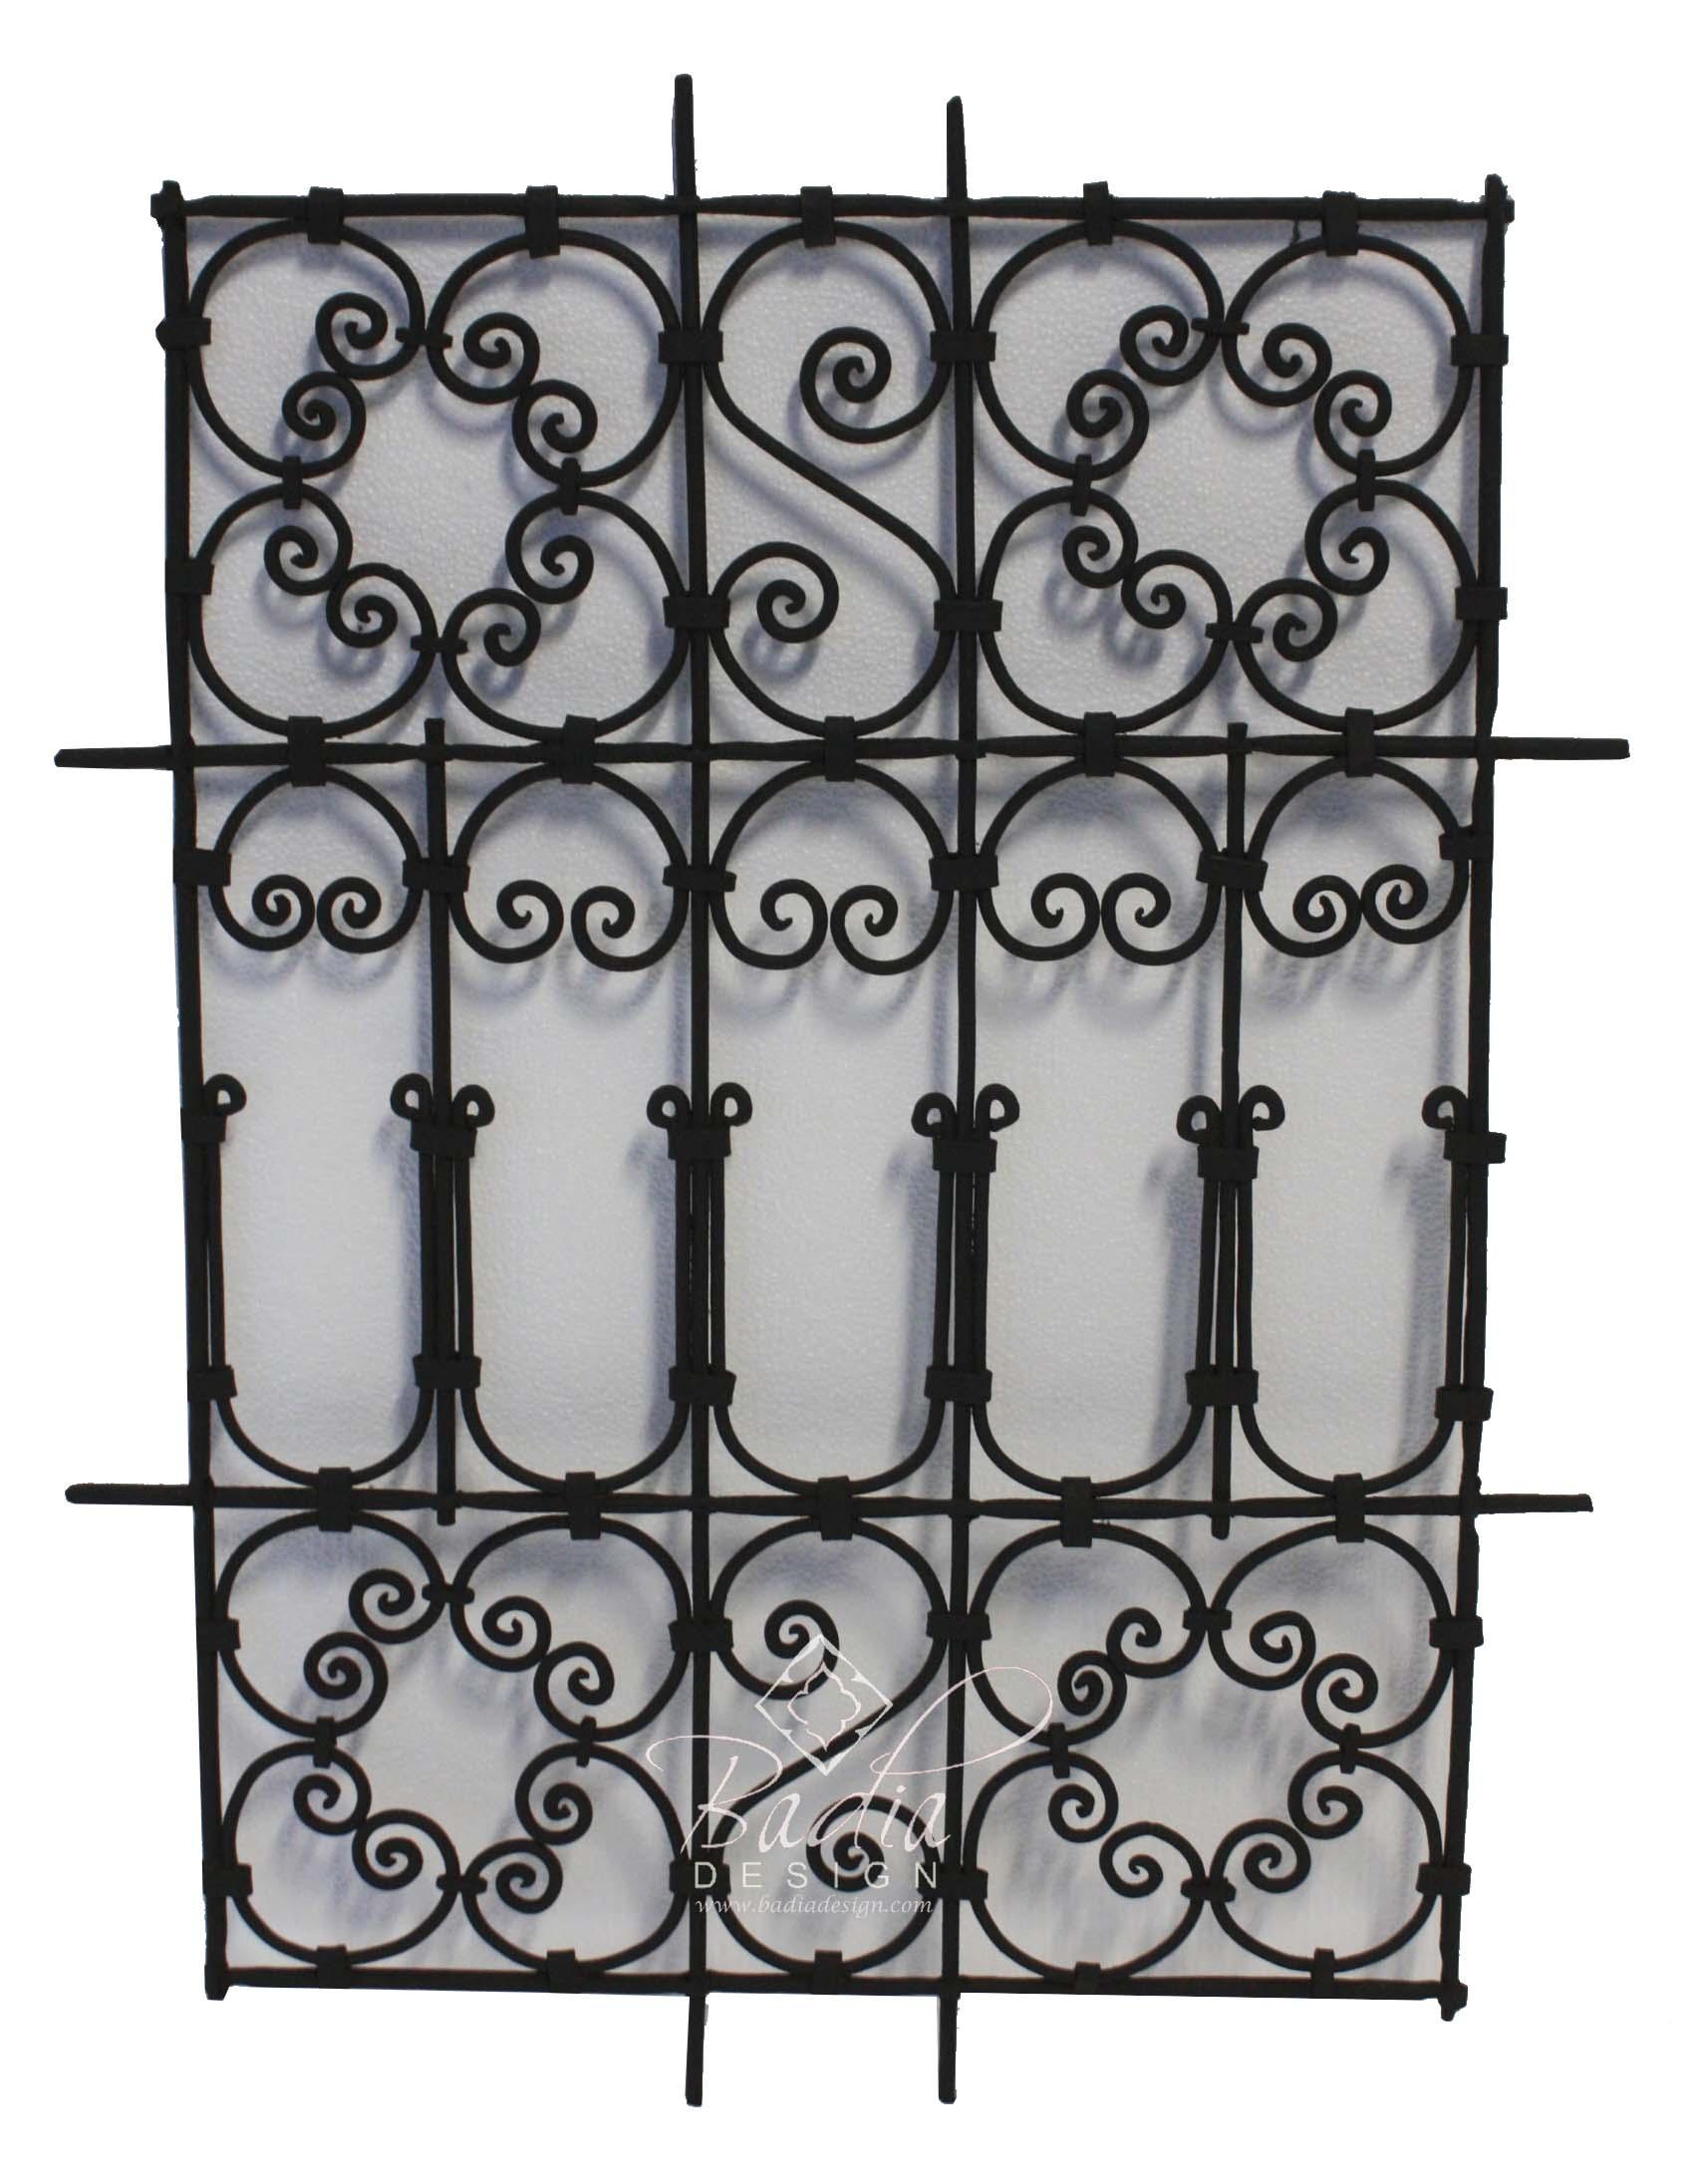 moroccan-rectangular-shaped-wrought-iron-panel-ip019.jpg